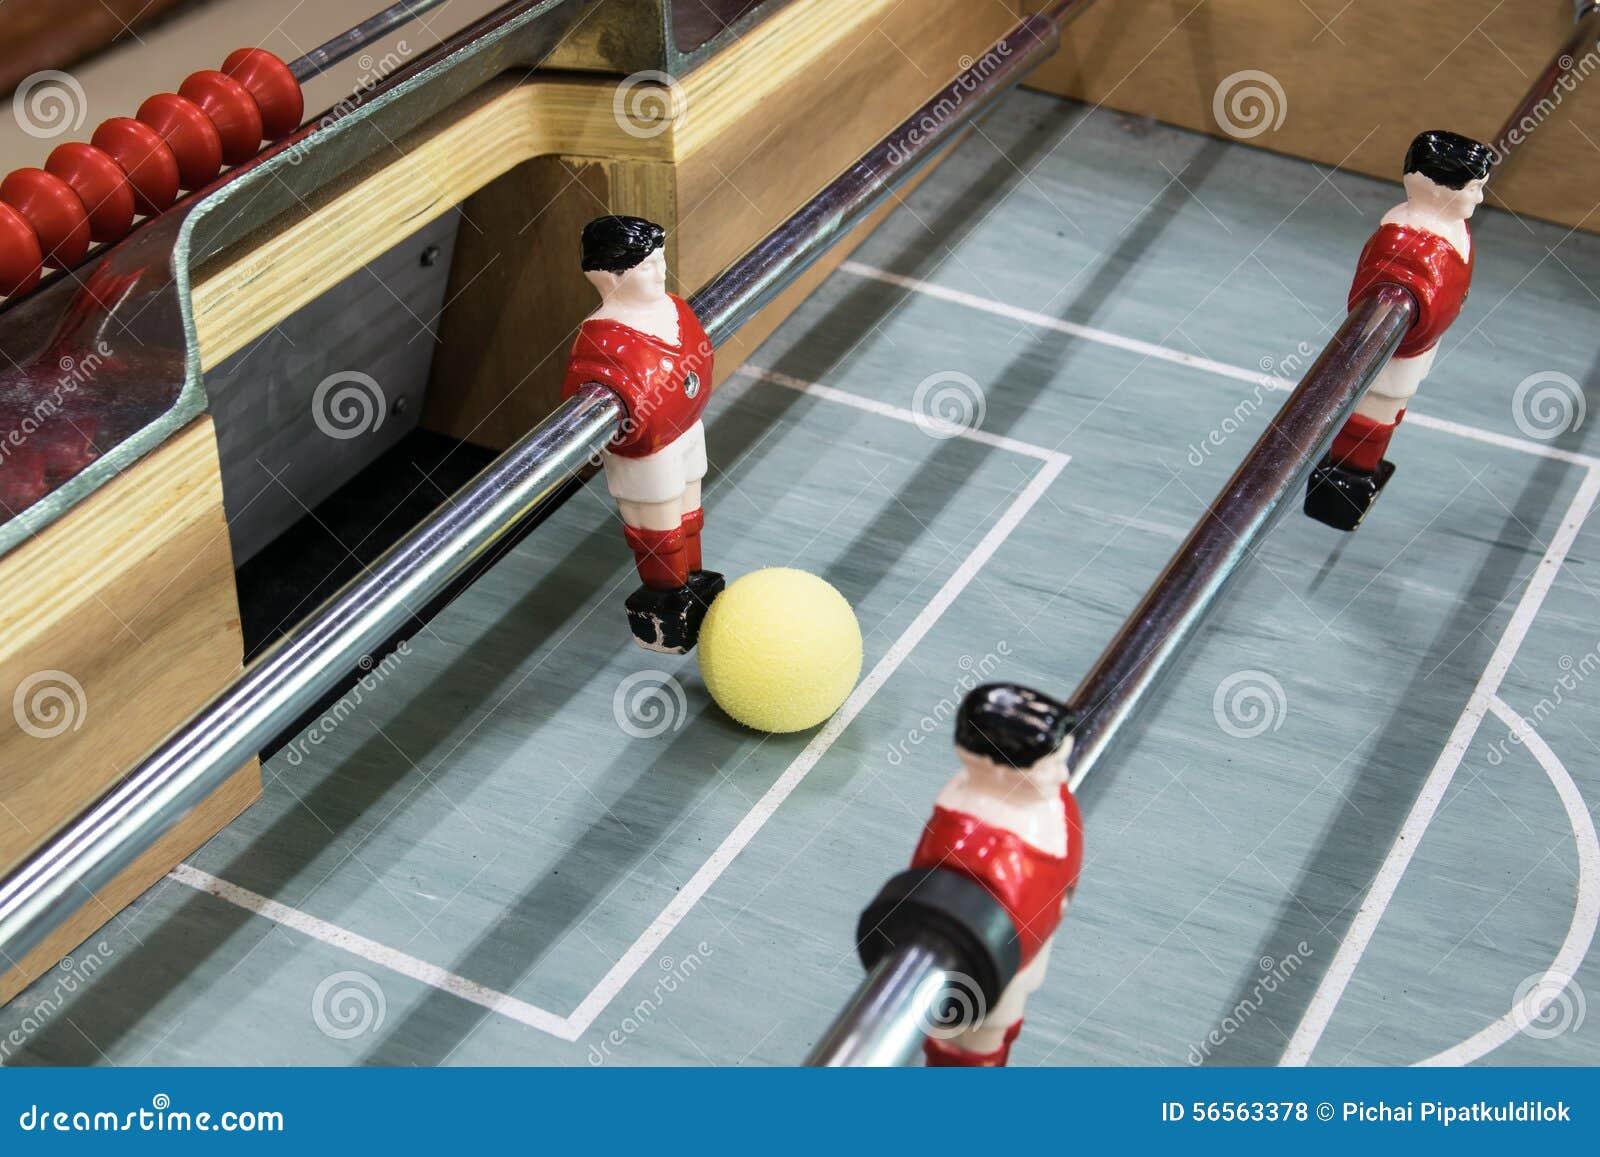 Download Λεπτομέρεια ενός παιχνιδιού επιτραπέζιου ποδοσφαίρου Στοκ Εικόνες - εικόνα από tabletop, ανταγωνισμός: 56563378